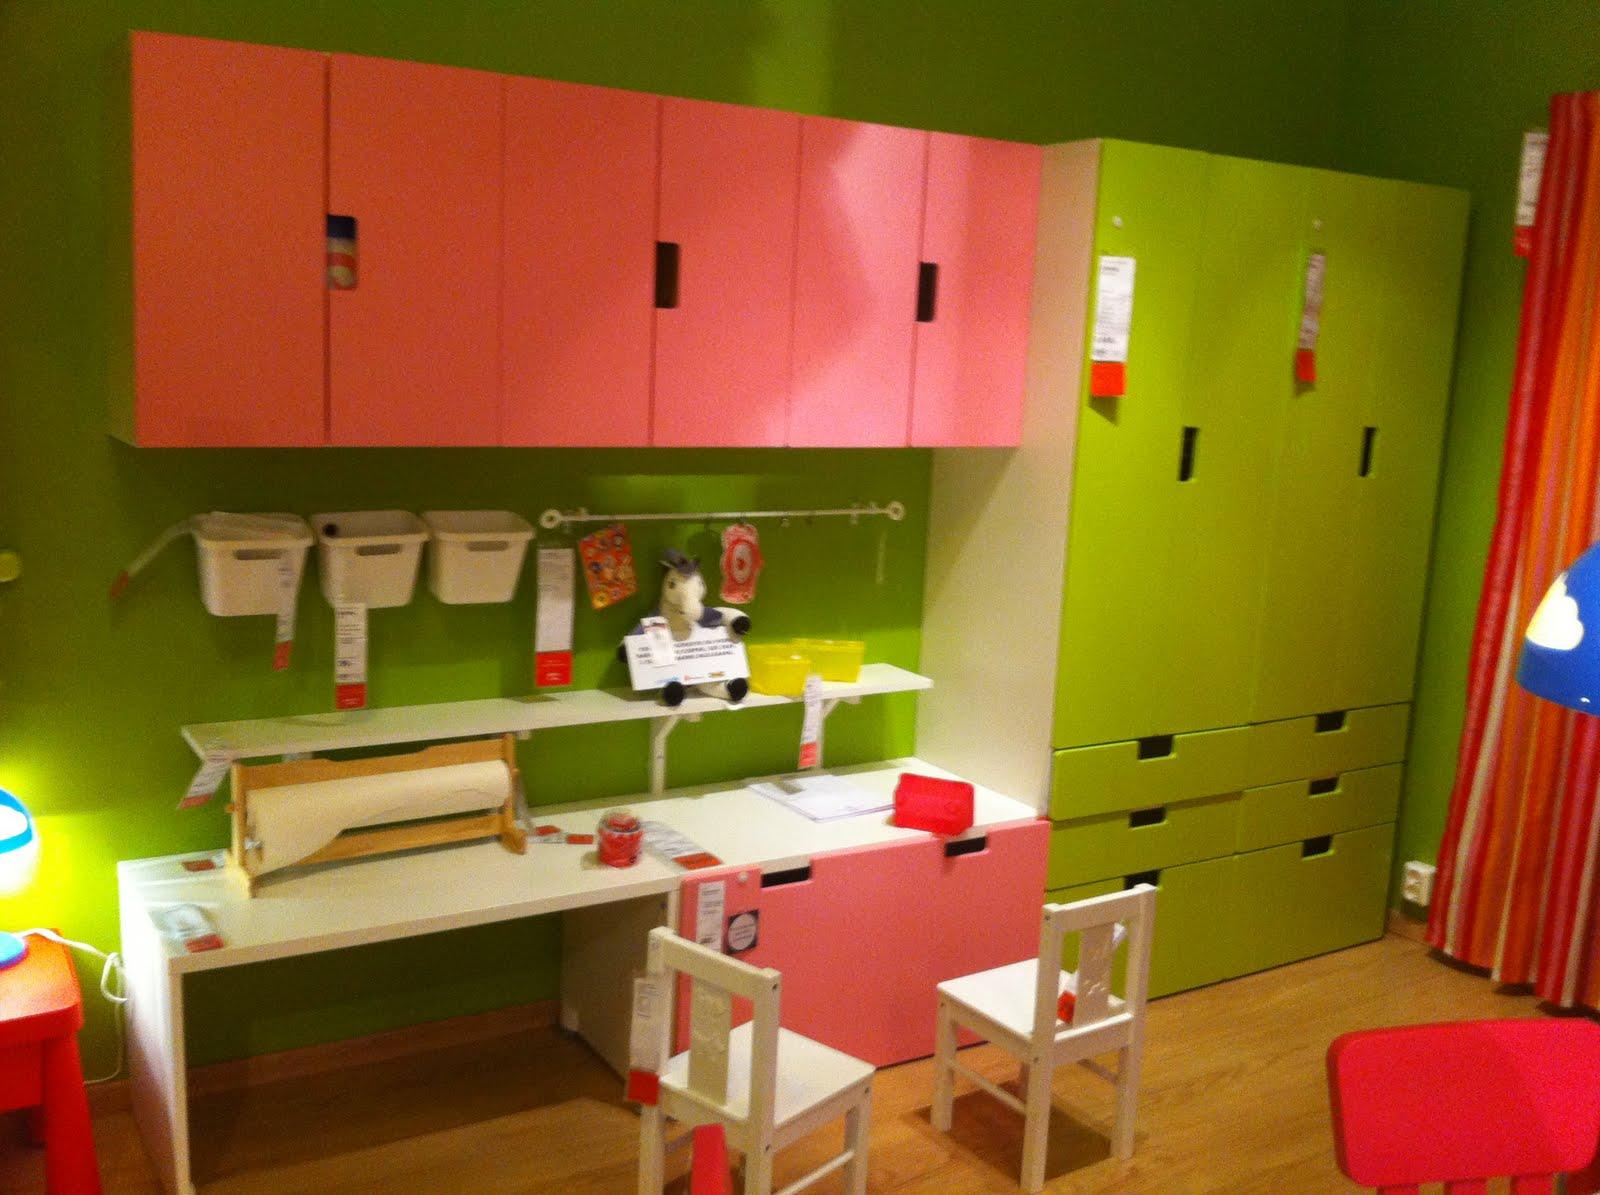 Camerette Ikea Stuva : Camerette a ponte ikea